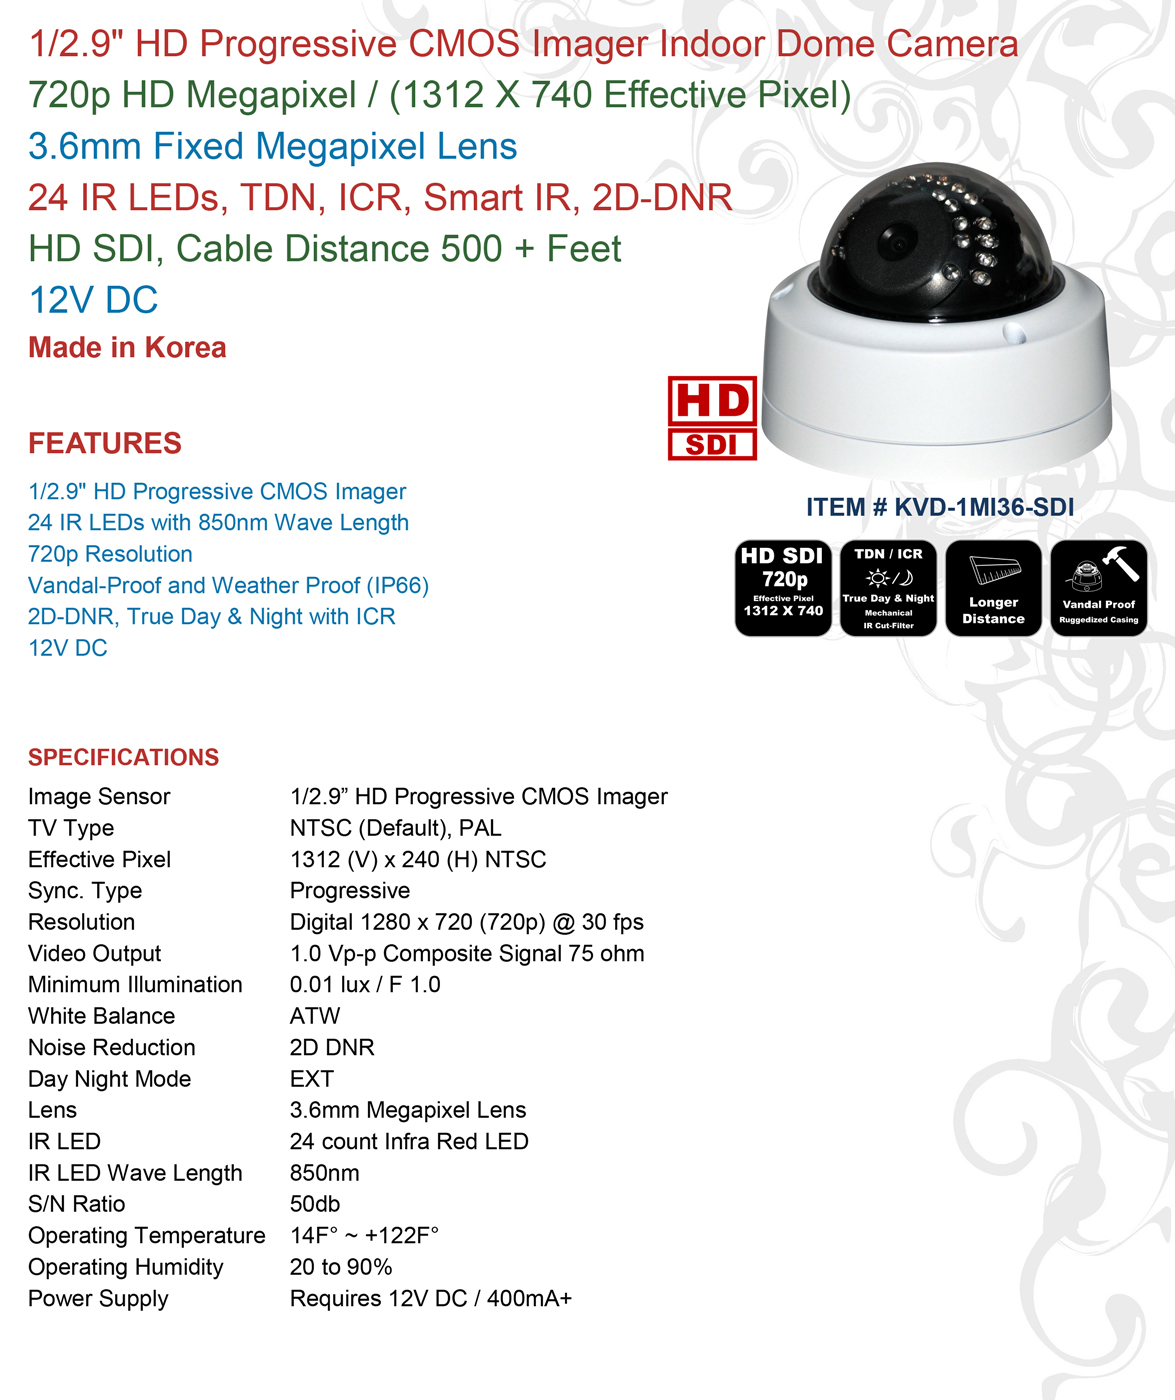 KVD-1MI36-SDI | CCTVSTAR Manufacture of Security Cameras